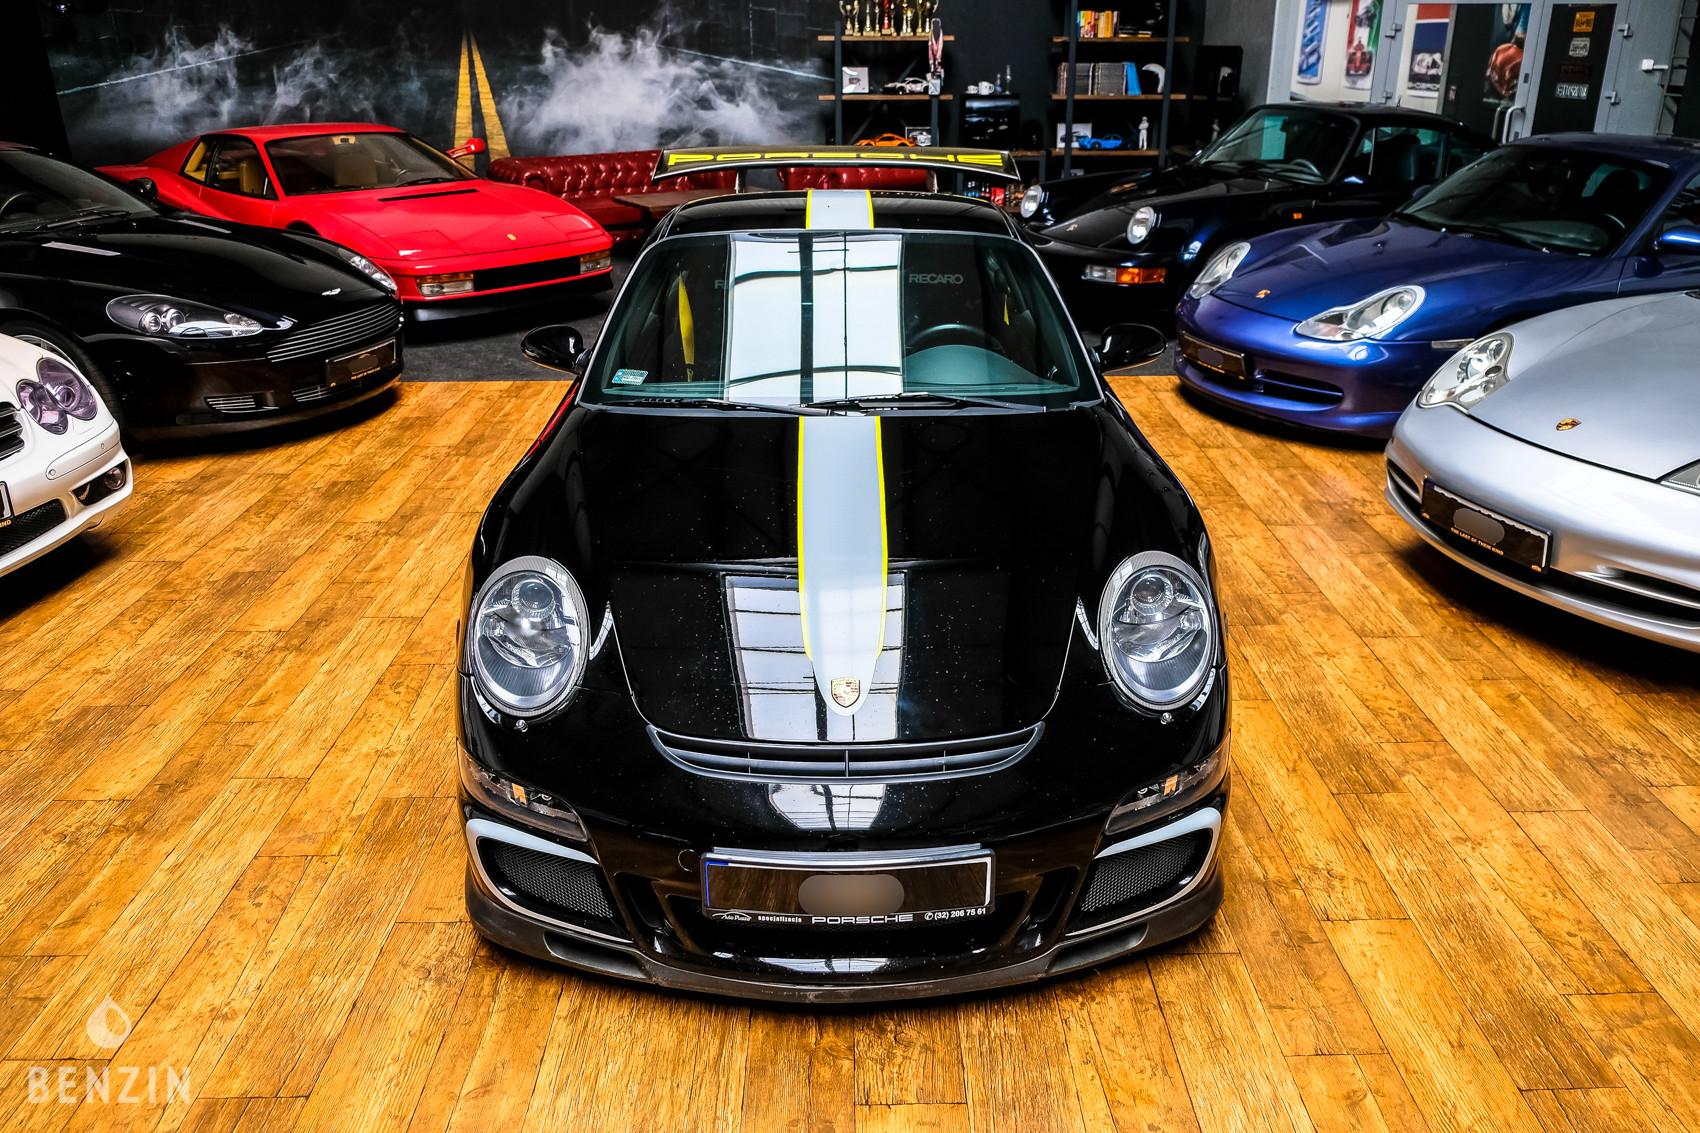 PORSCHE 911 997 GT3 PHASE 1 CLUBSPORT MG MOTORSPORT EXHAUST 2007